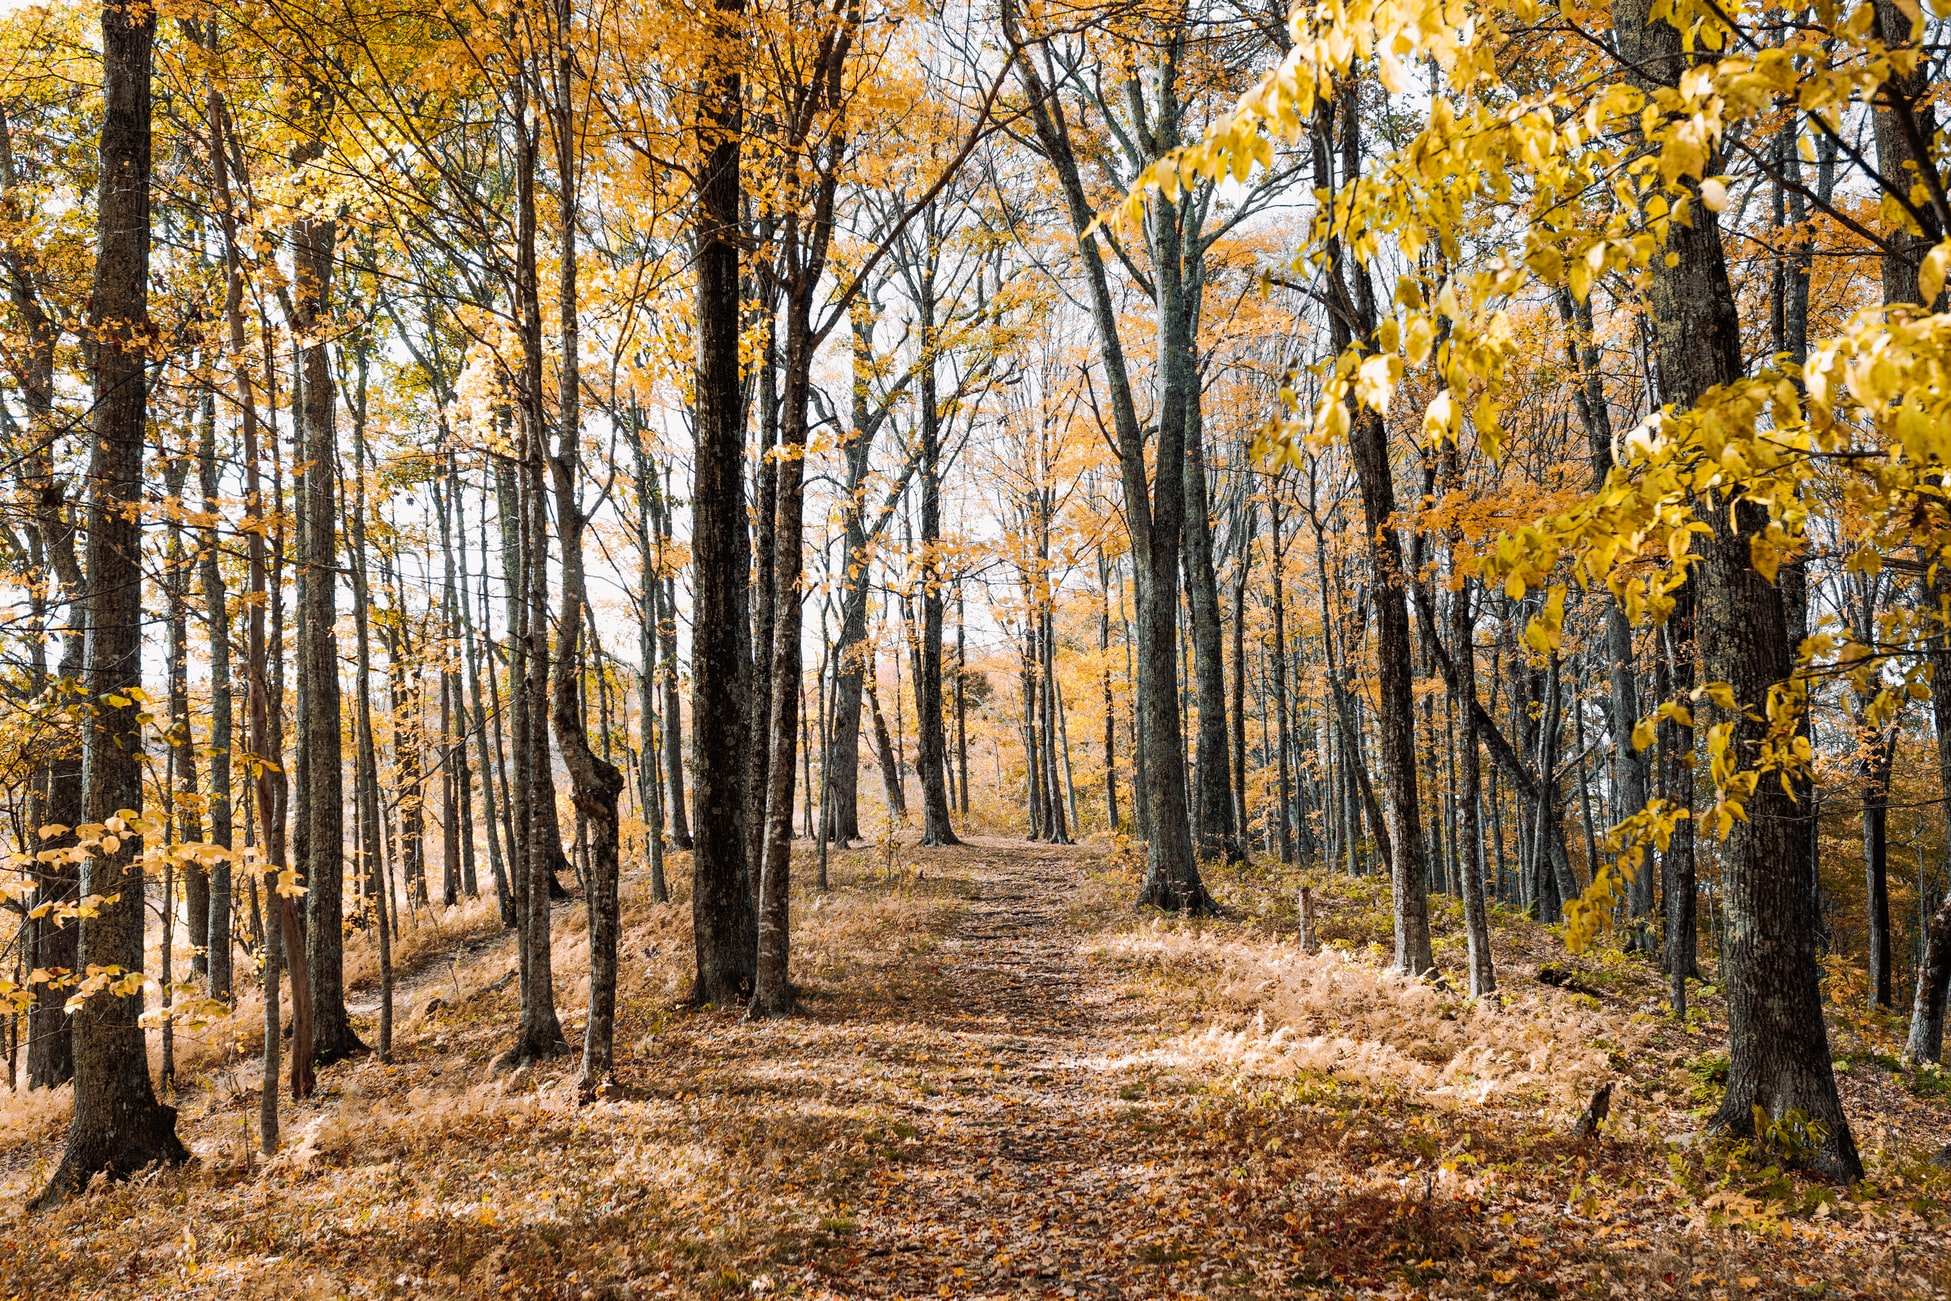 grove of trees in autumn in Hot Springs, Arkansas